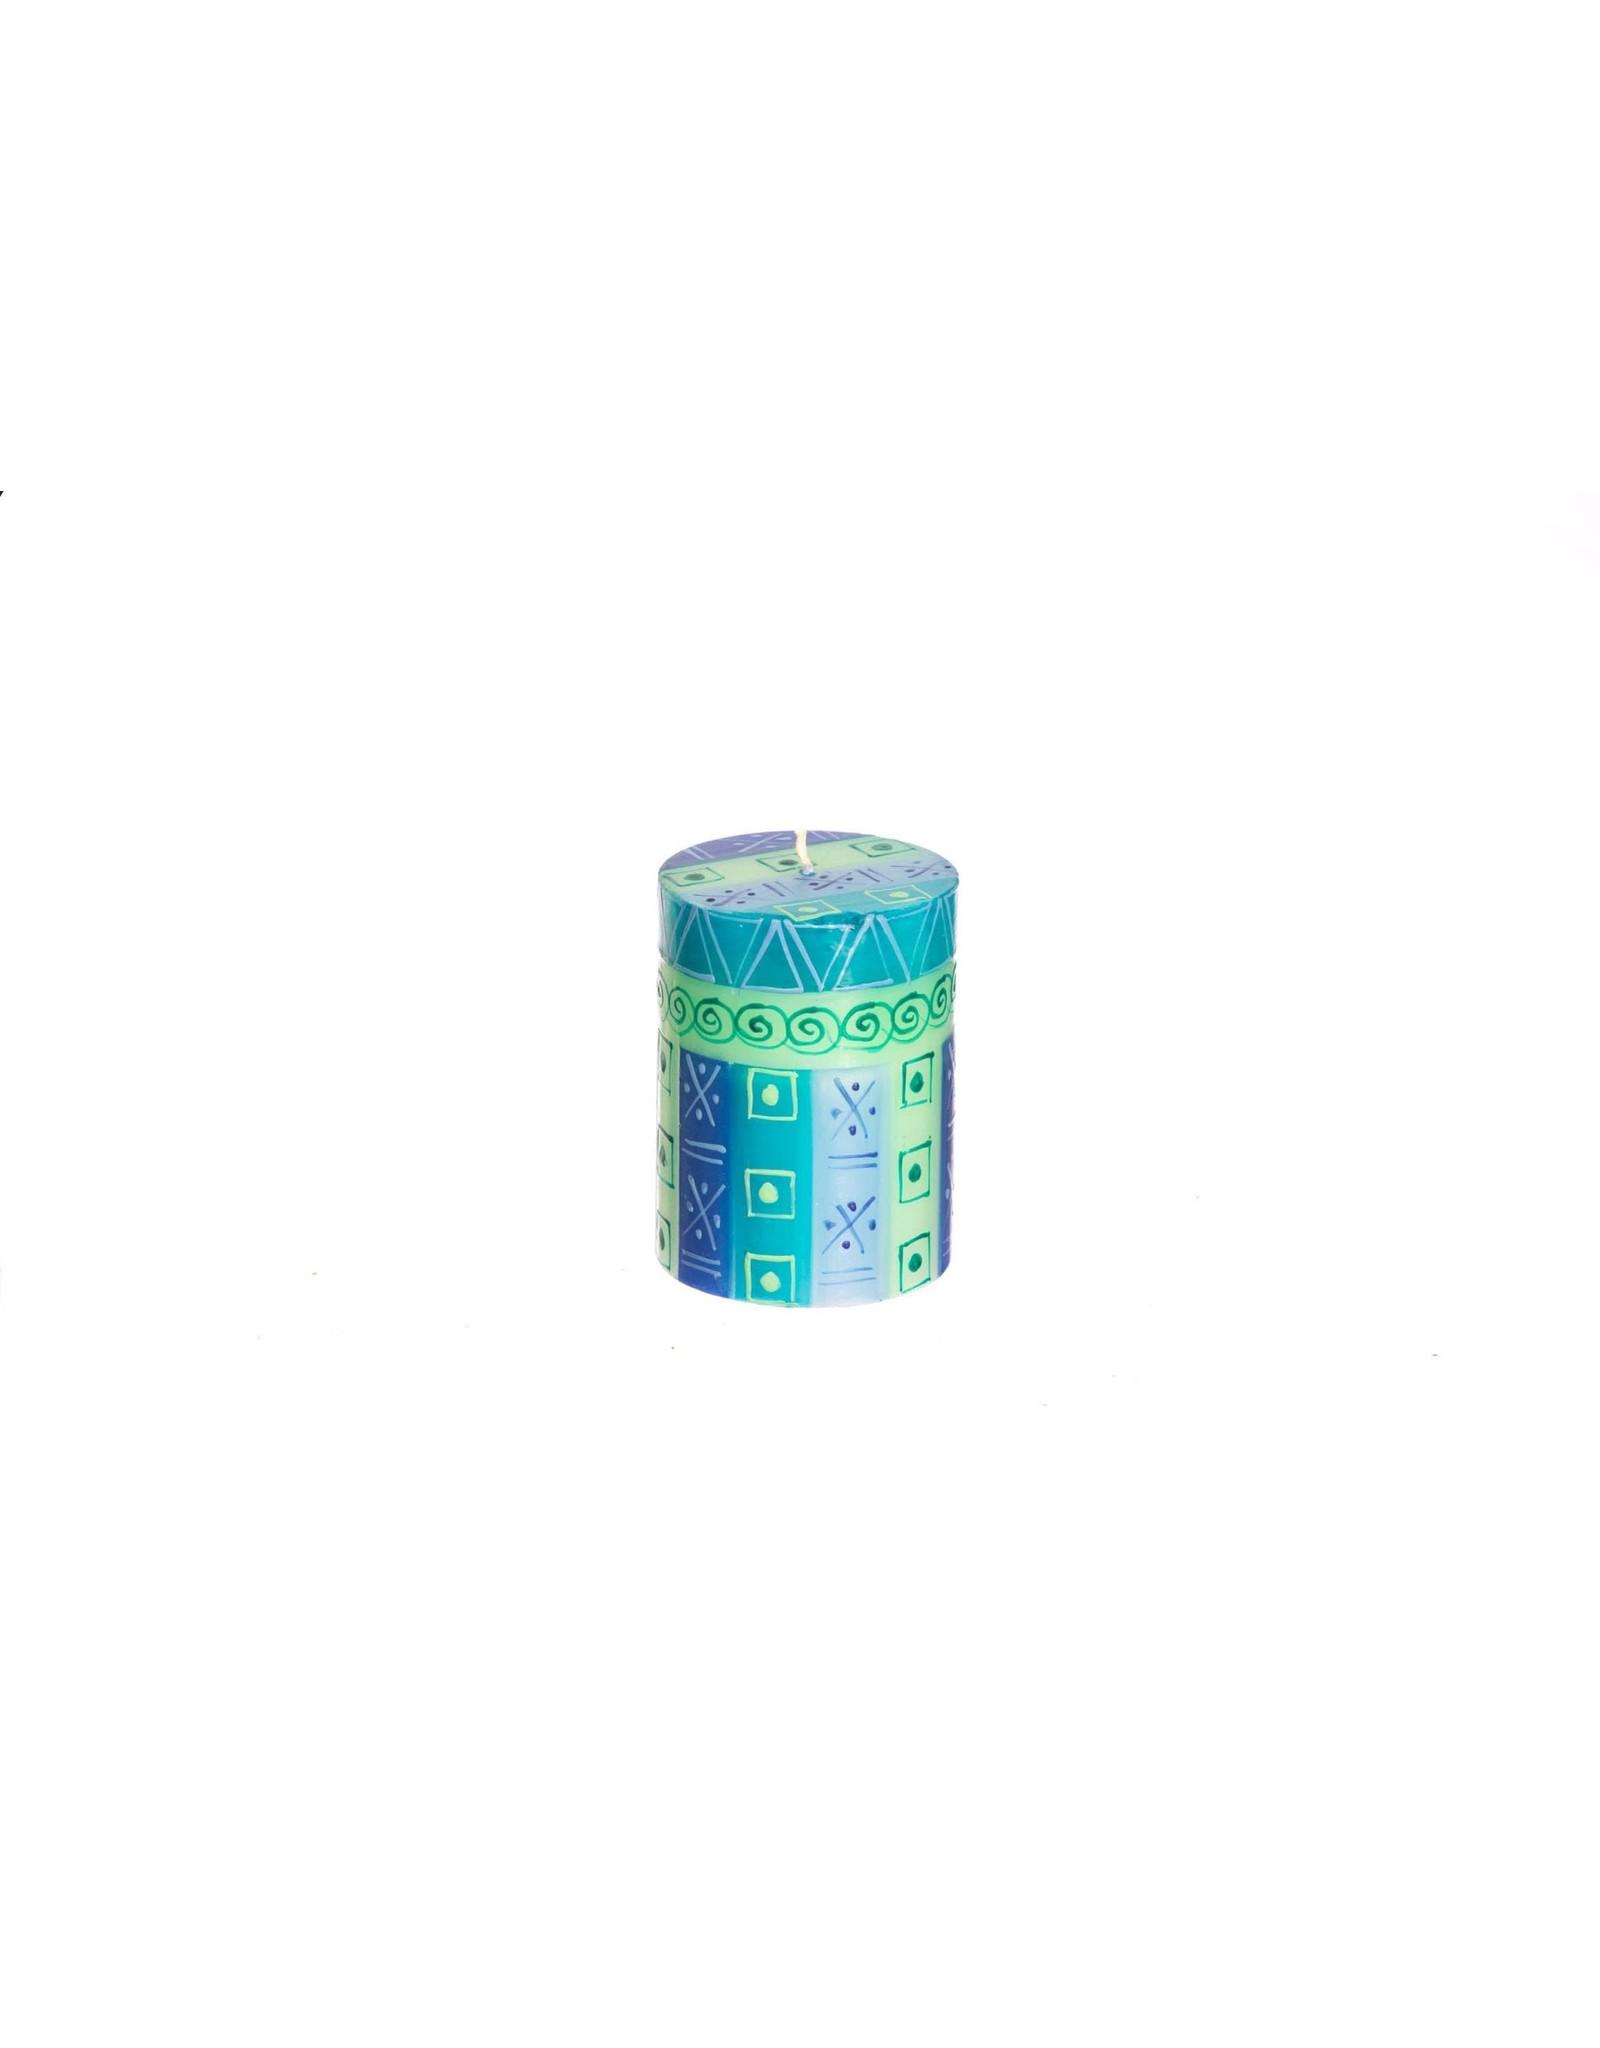 Blue/Green 3 x 4 Pillar Candle, South Africa